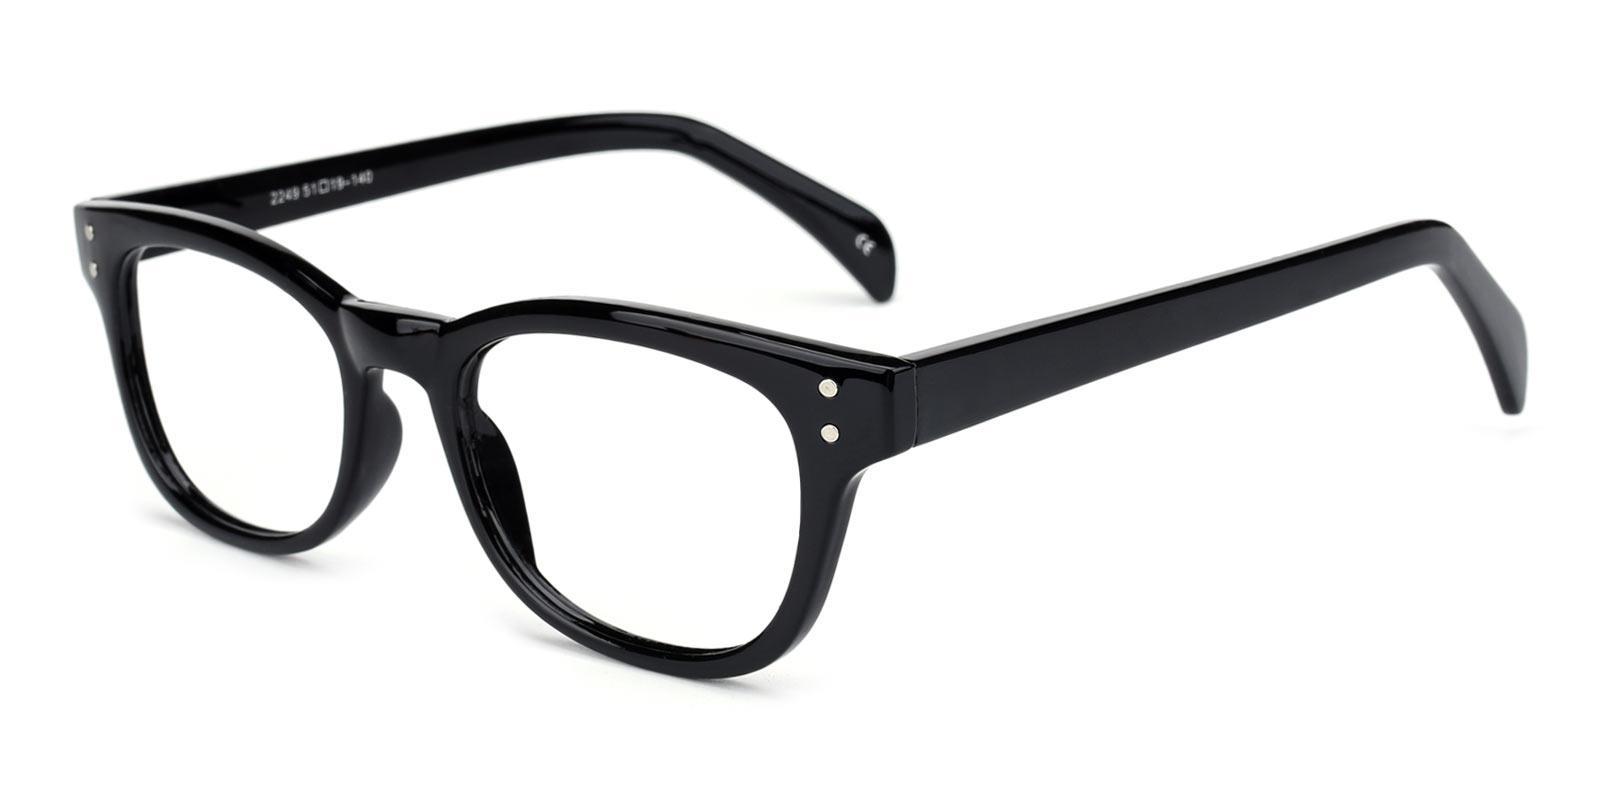 Bob-Black-Rectangle-Plastic-Eyeglasses-detail